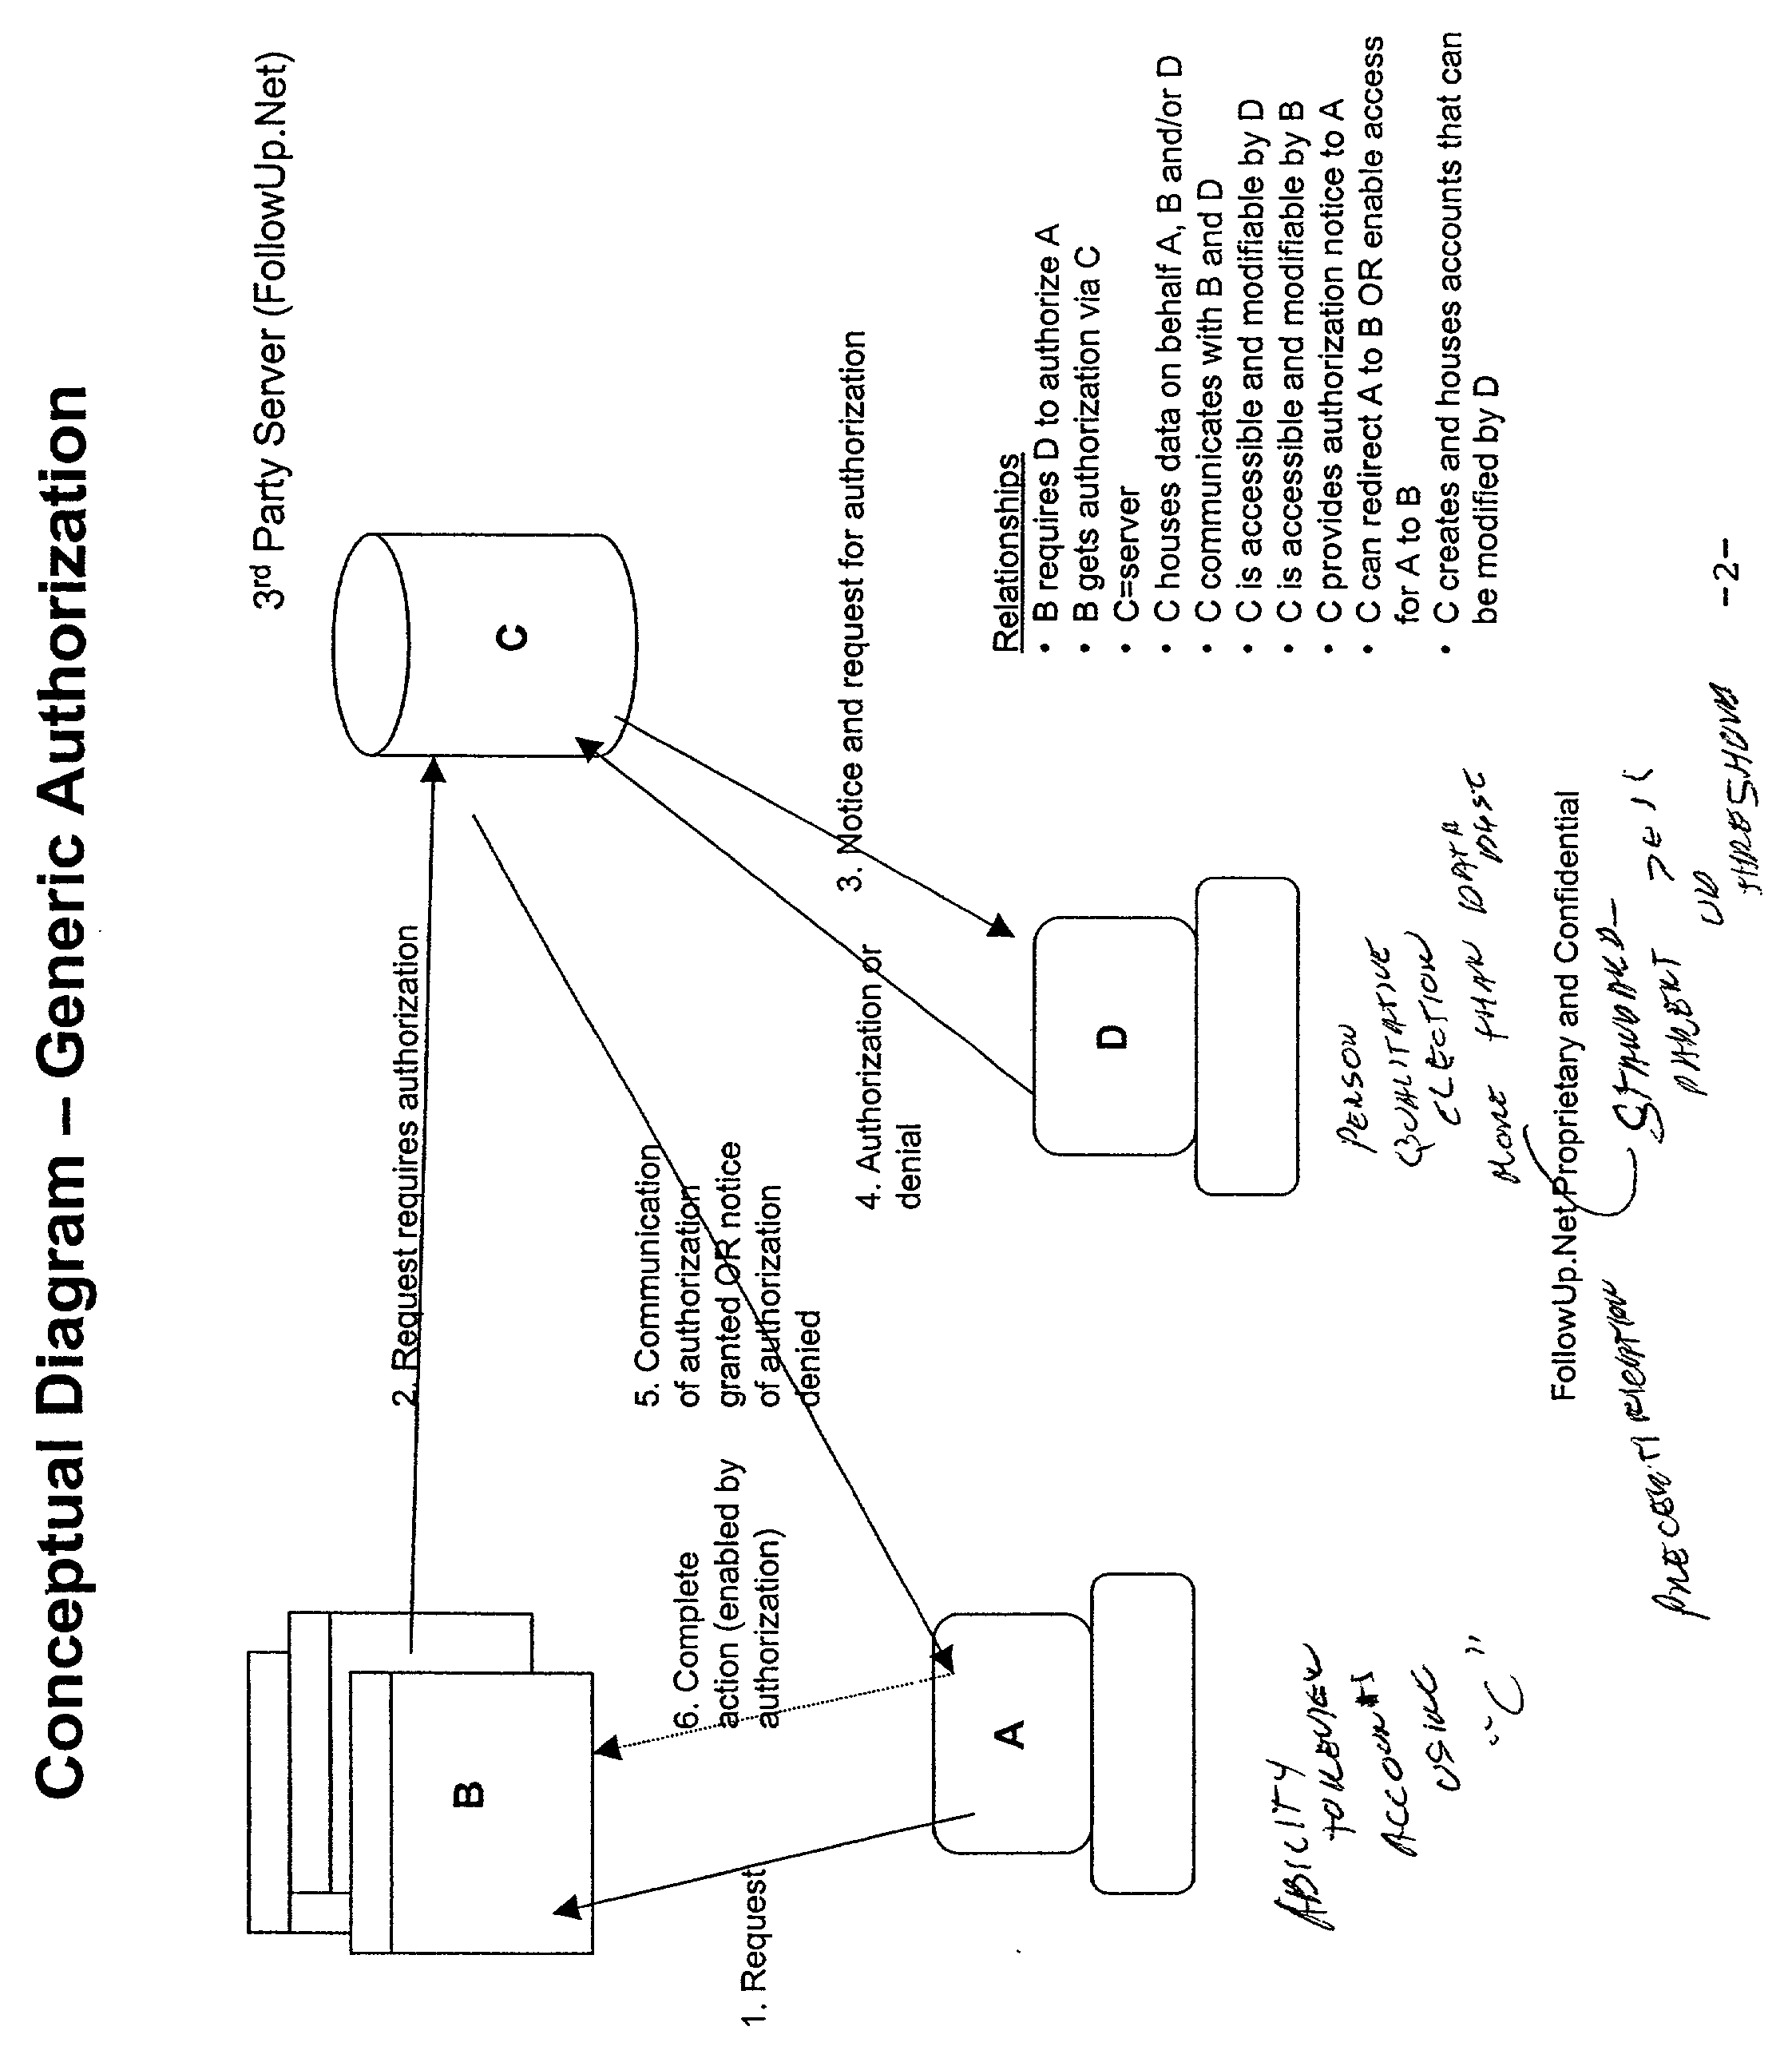 Figure US20020049907A1-20020425-P00008